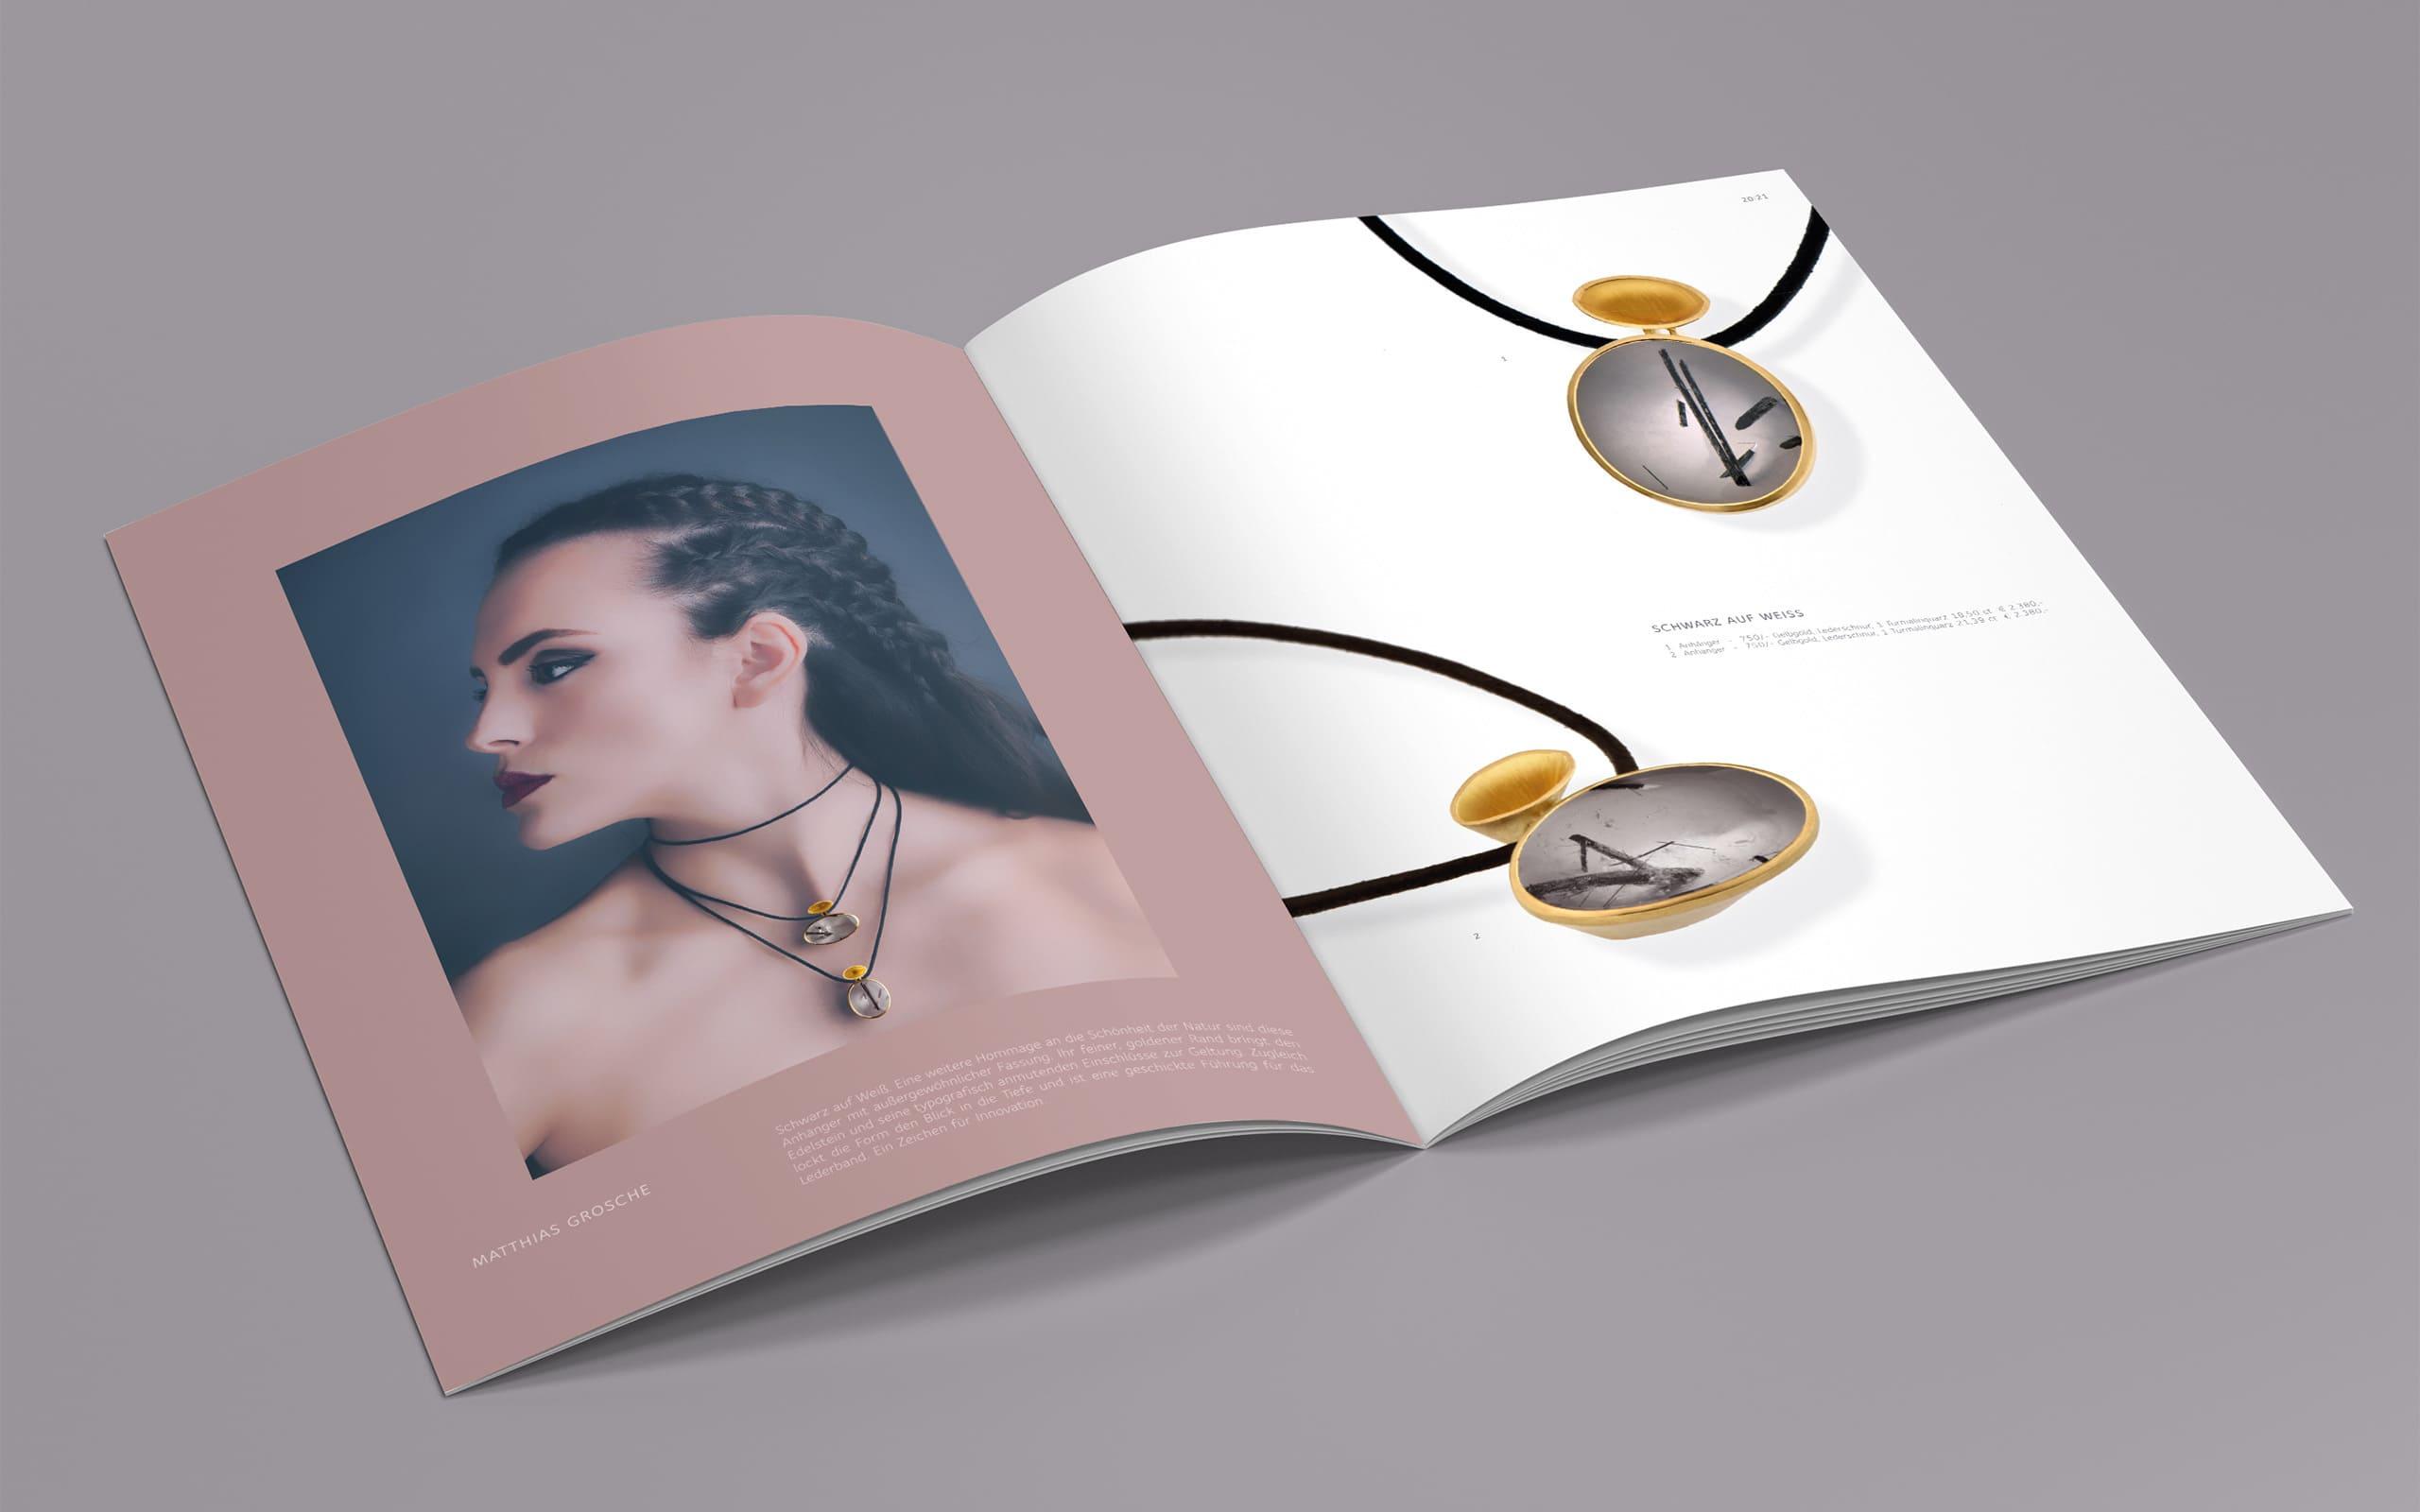 Mockup_A4_Brochure_3-Kopie-iloveimg-compressed